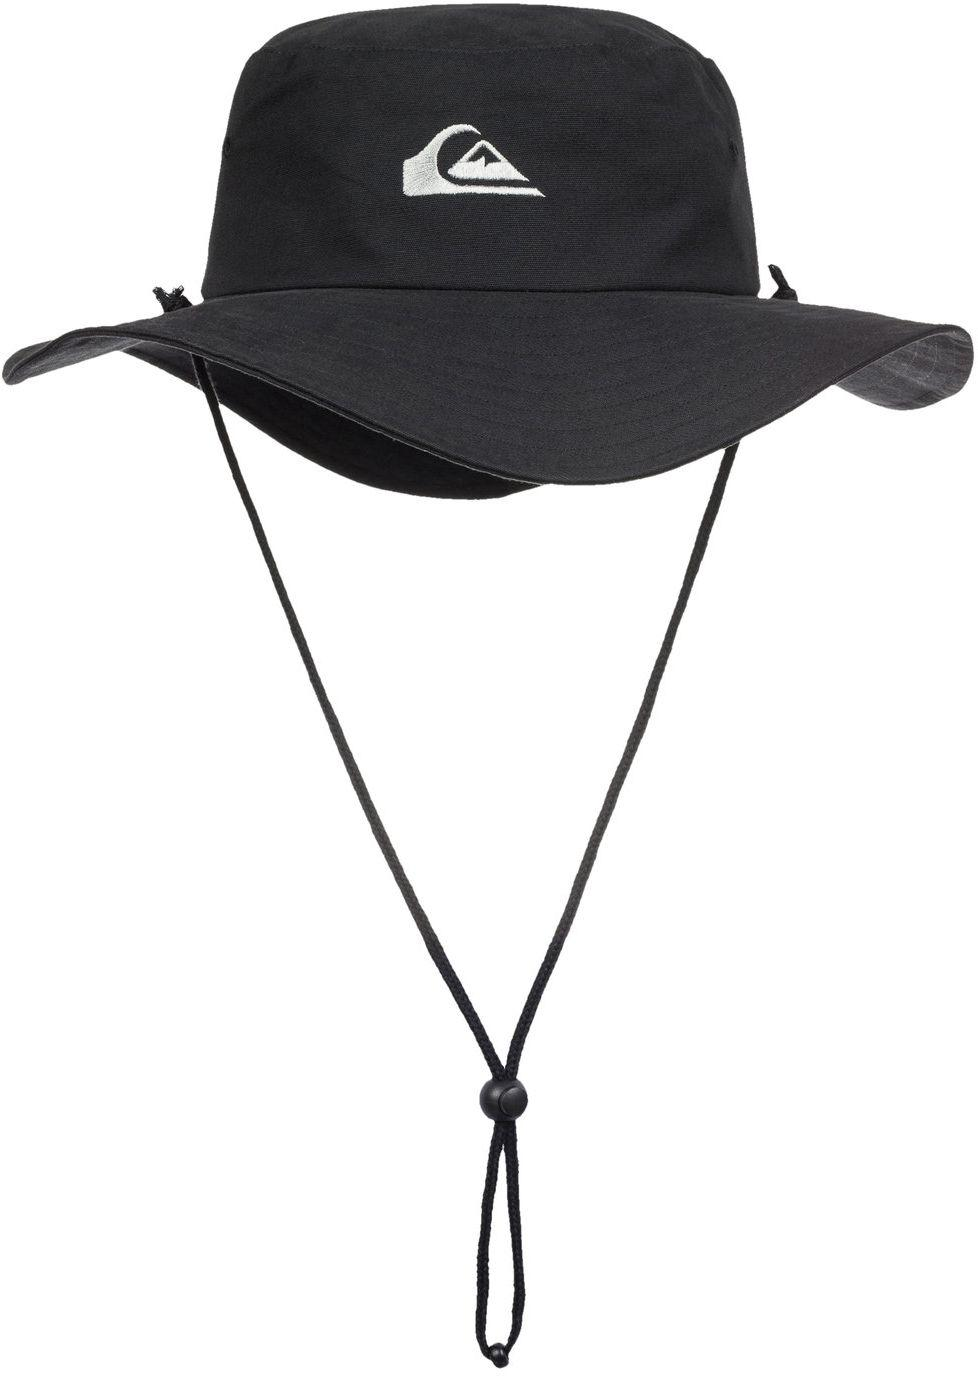 the best attitude d3f87 f728f Lyst - Quiksilver Ushmaster Safari Hat in Black for Men - Save 65%